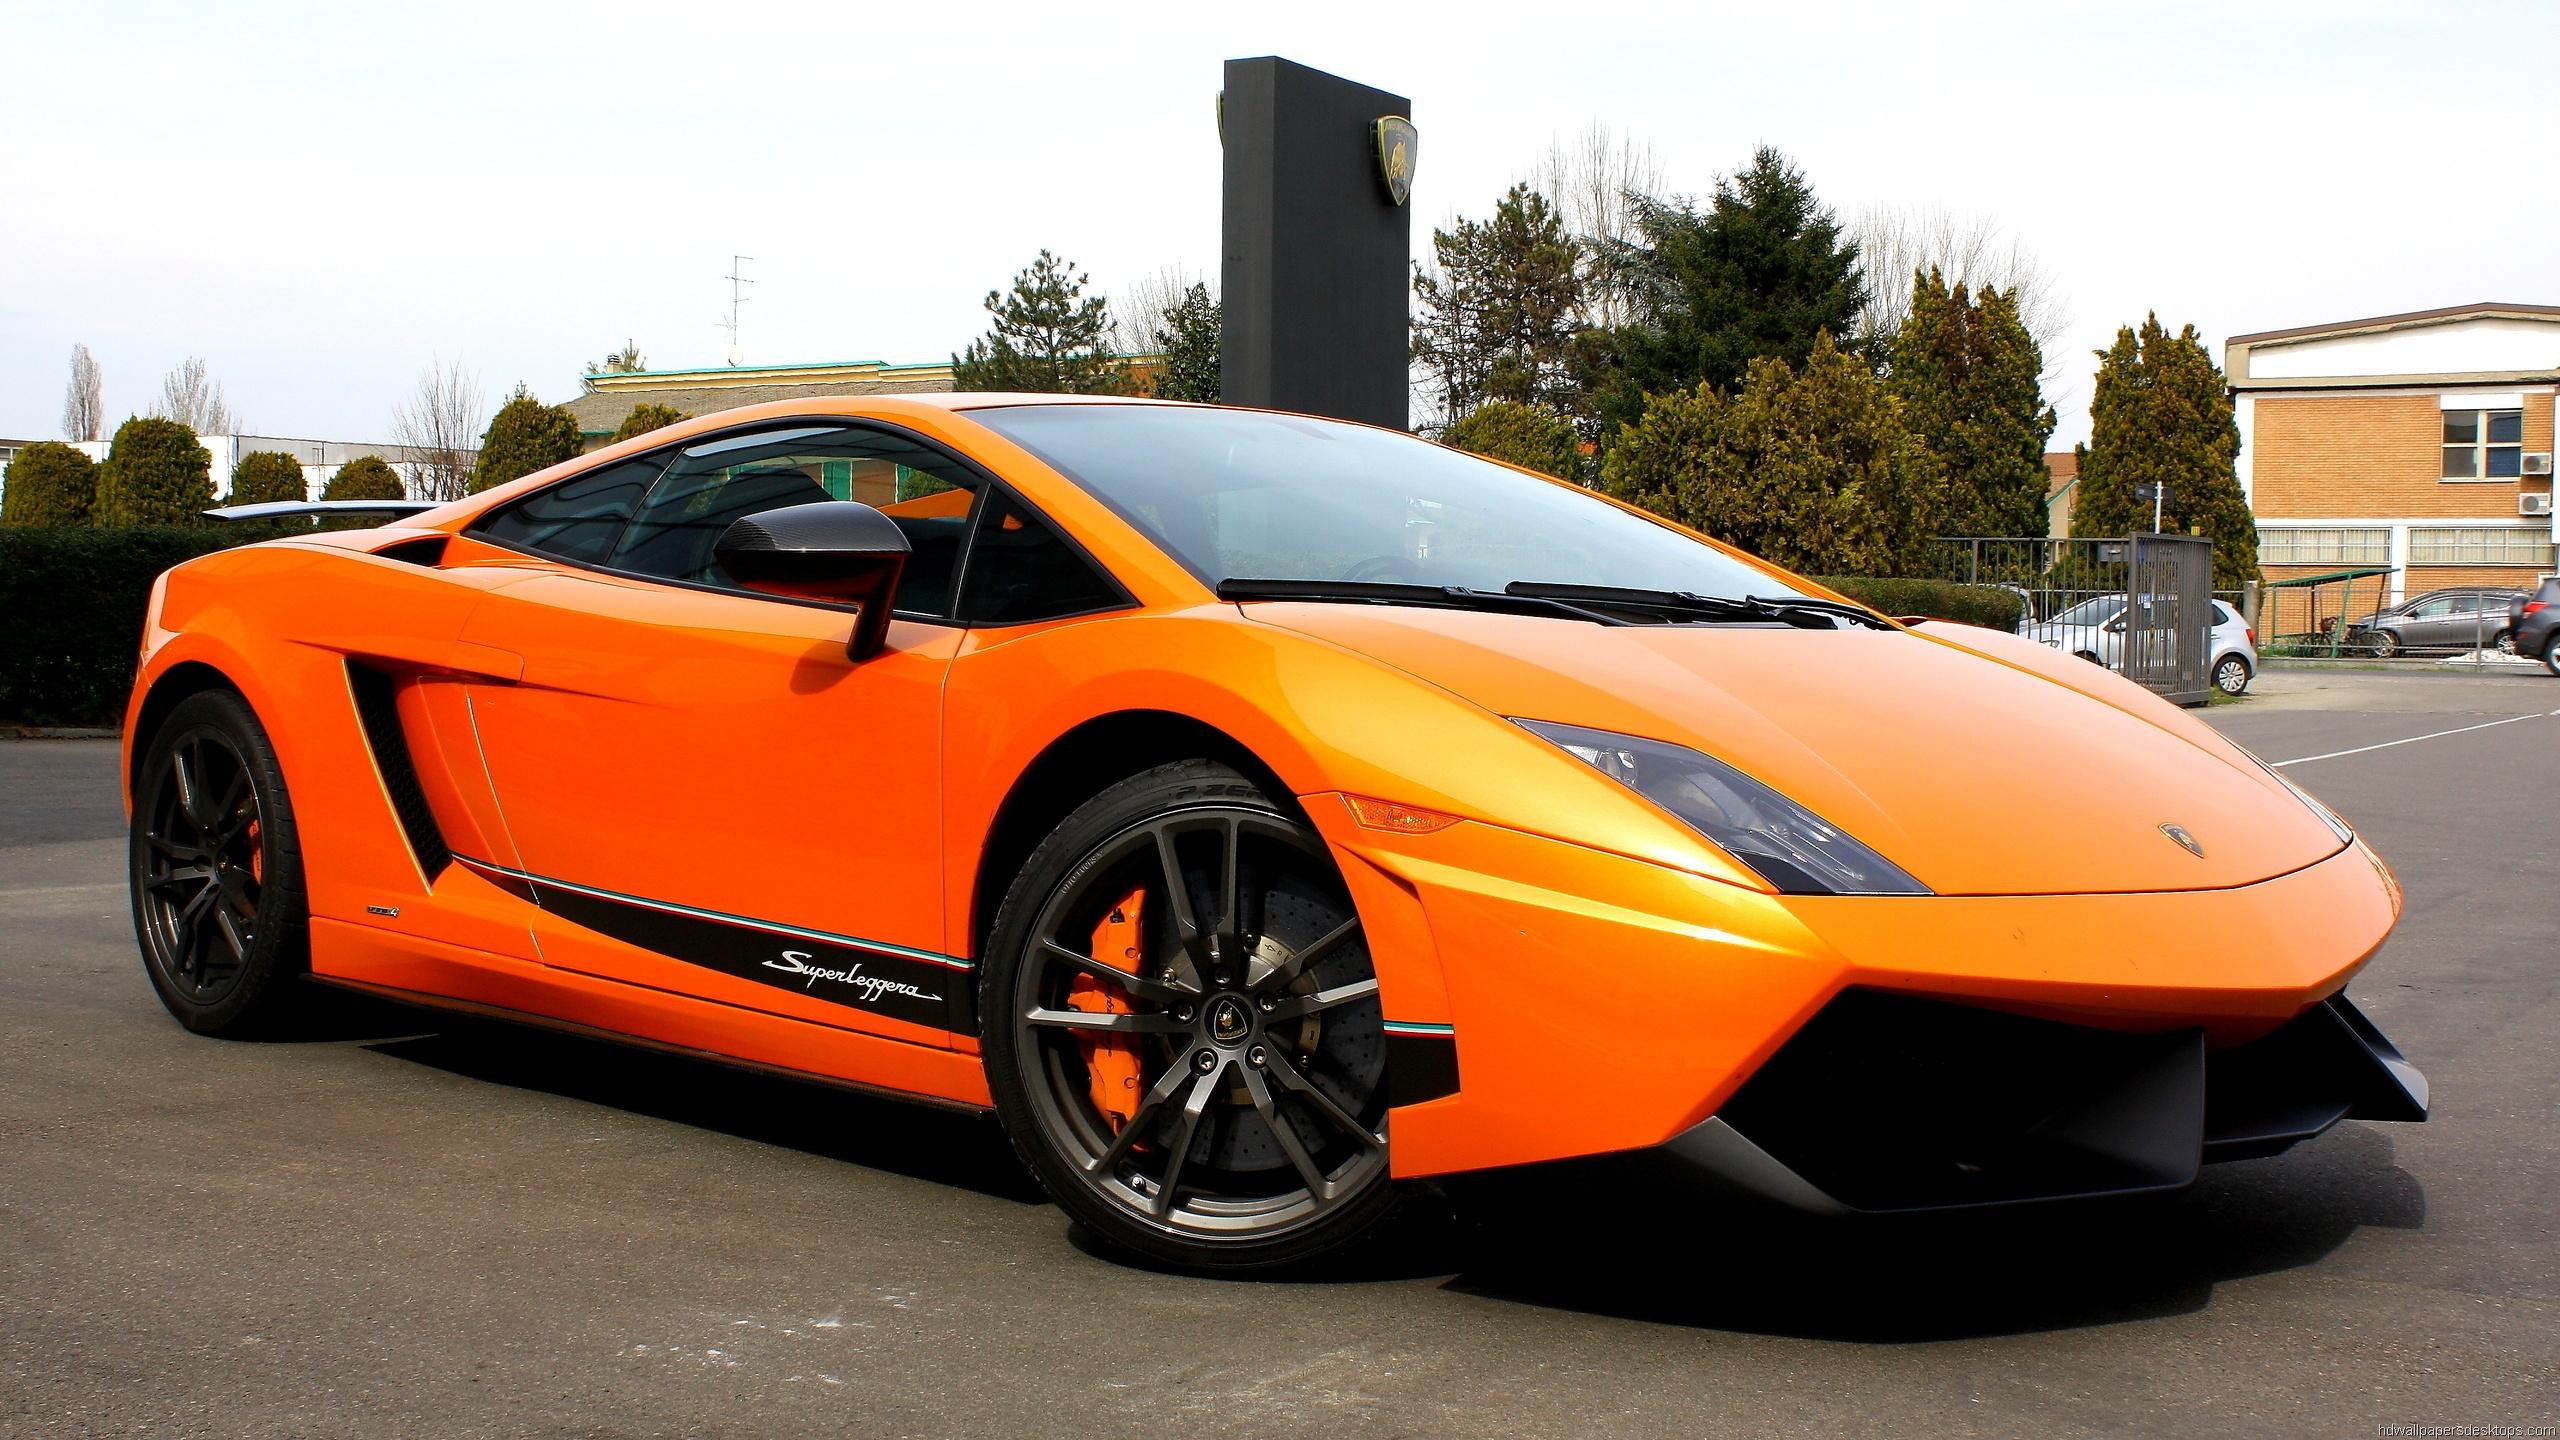 Cars Wallpapers HD Full HD 1080p Desktop Backgrounds 2560x1440 2560x1440